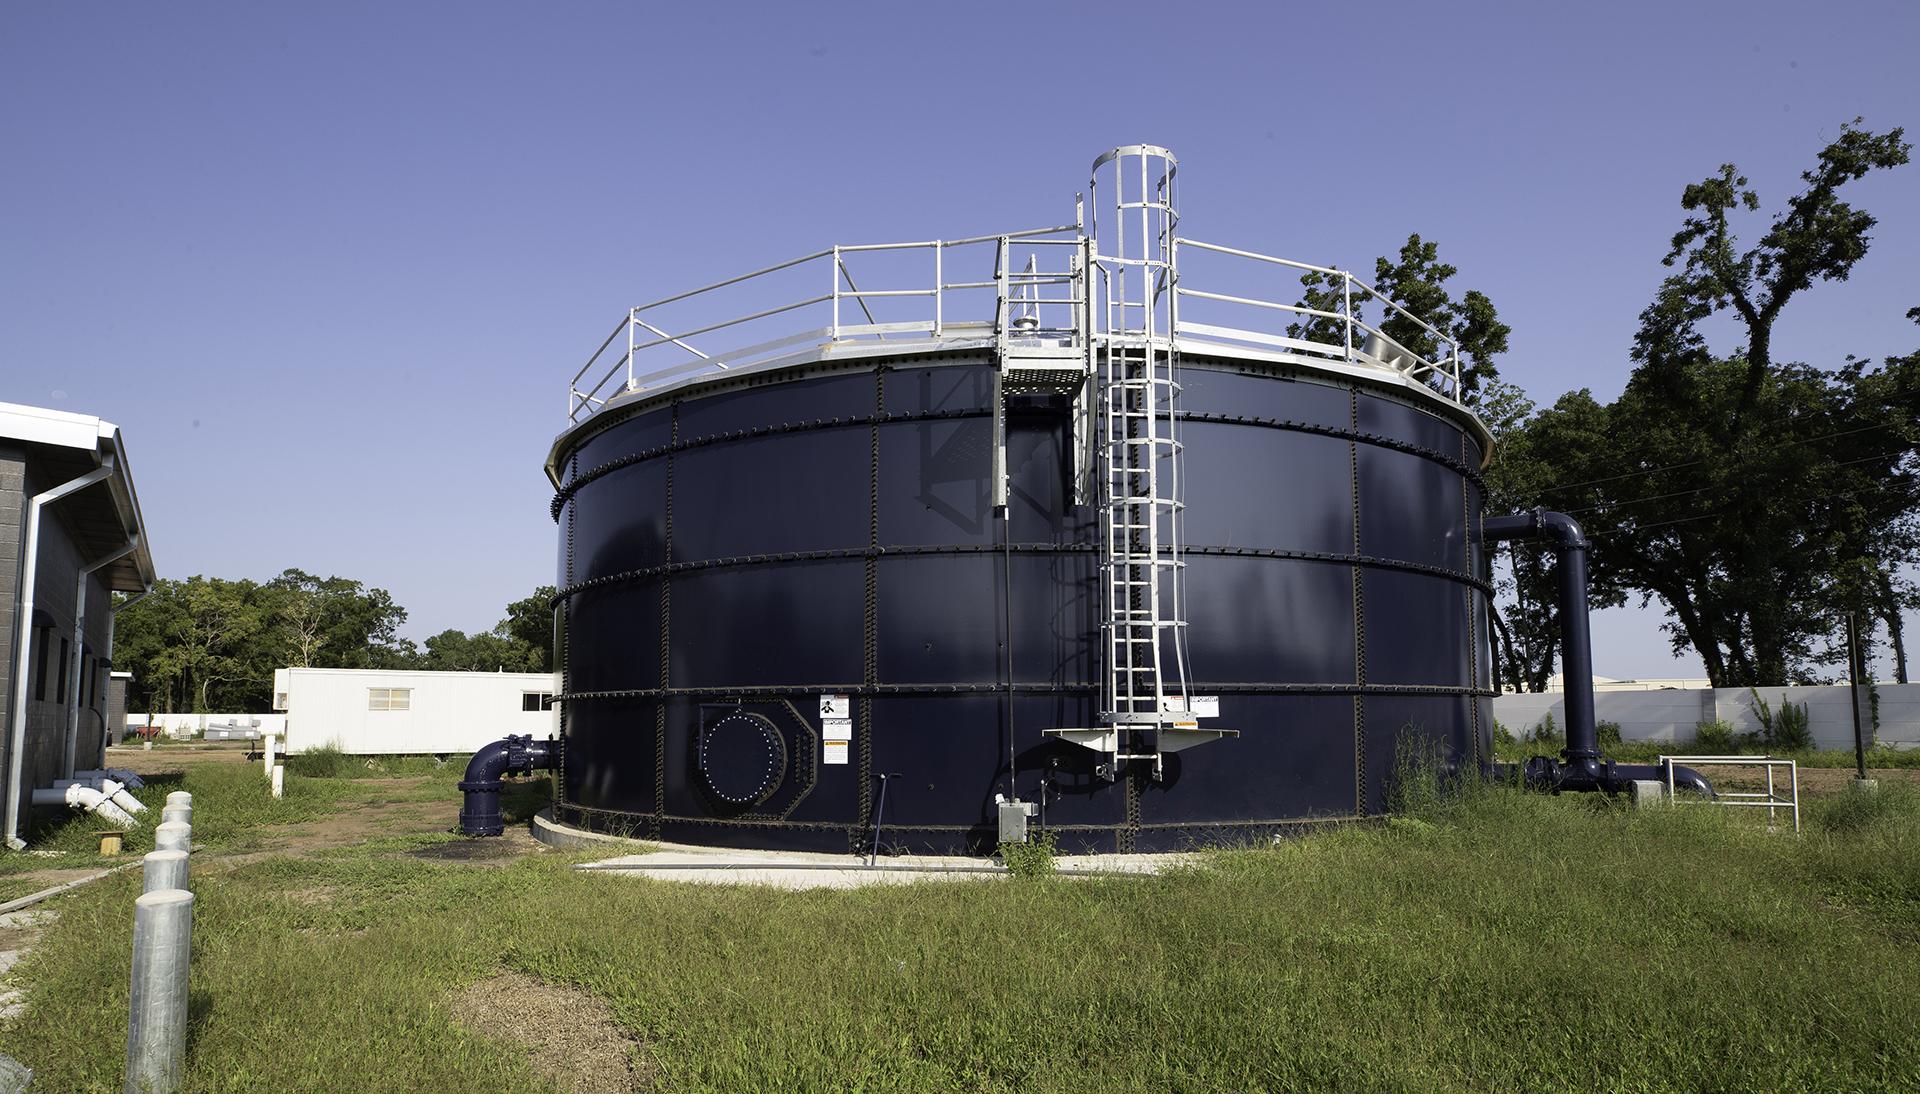 Sienna Plantation Wastewater System-Houston, Texas